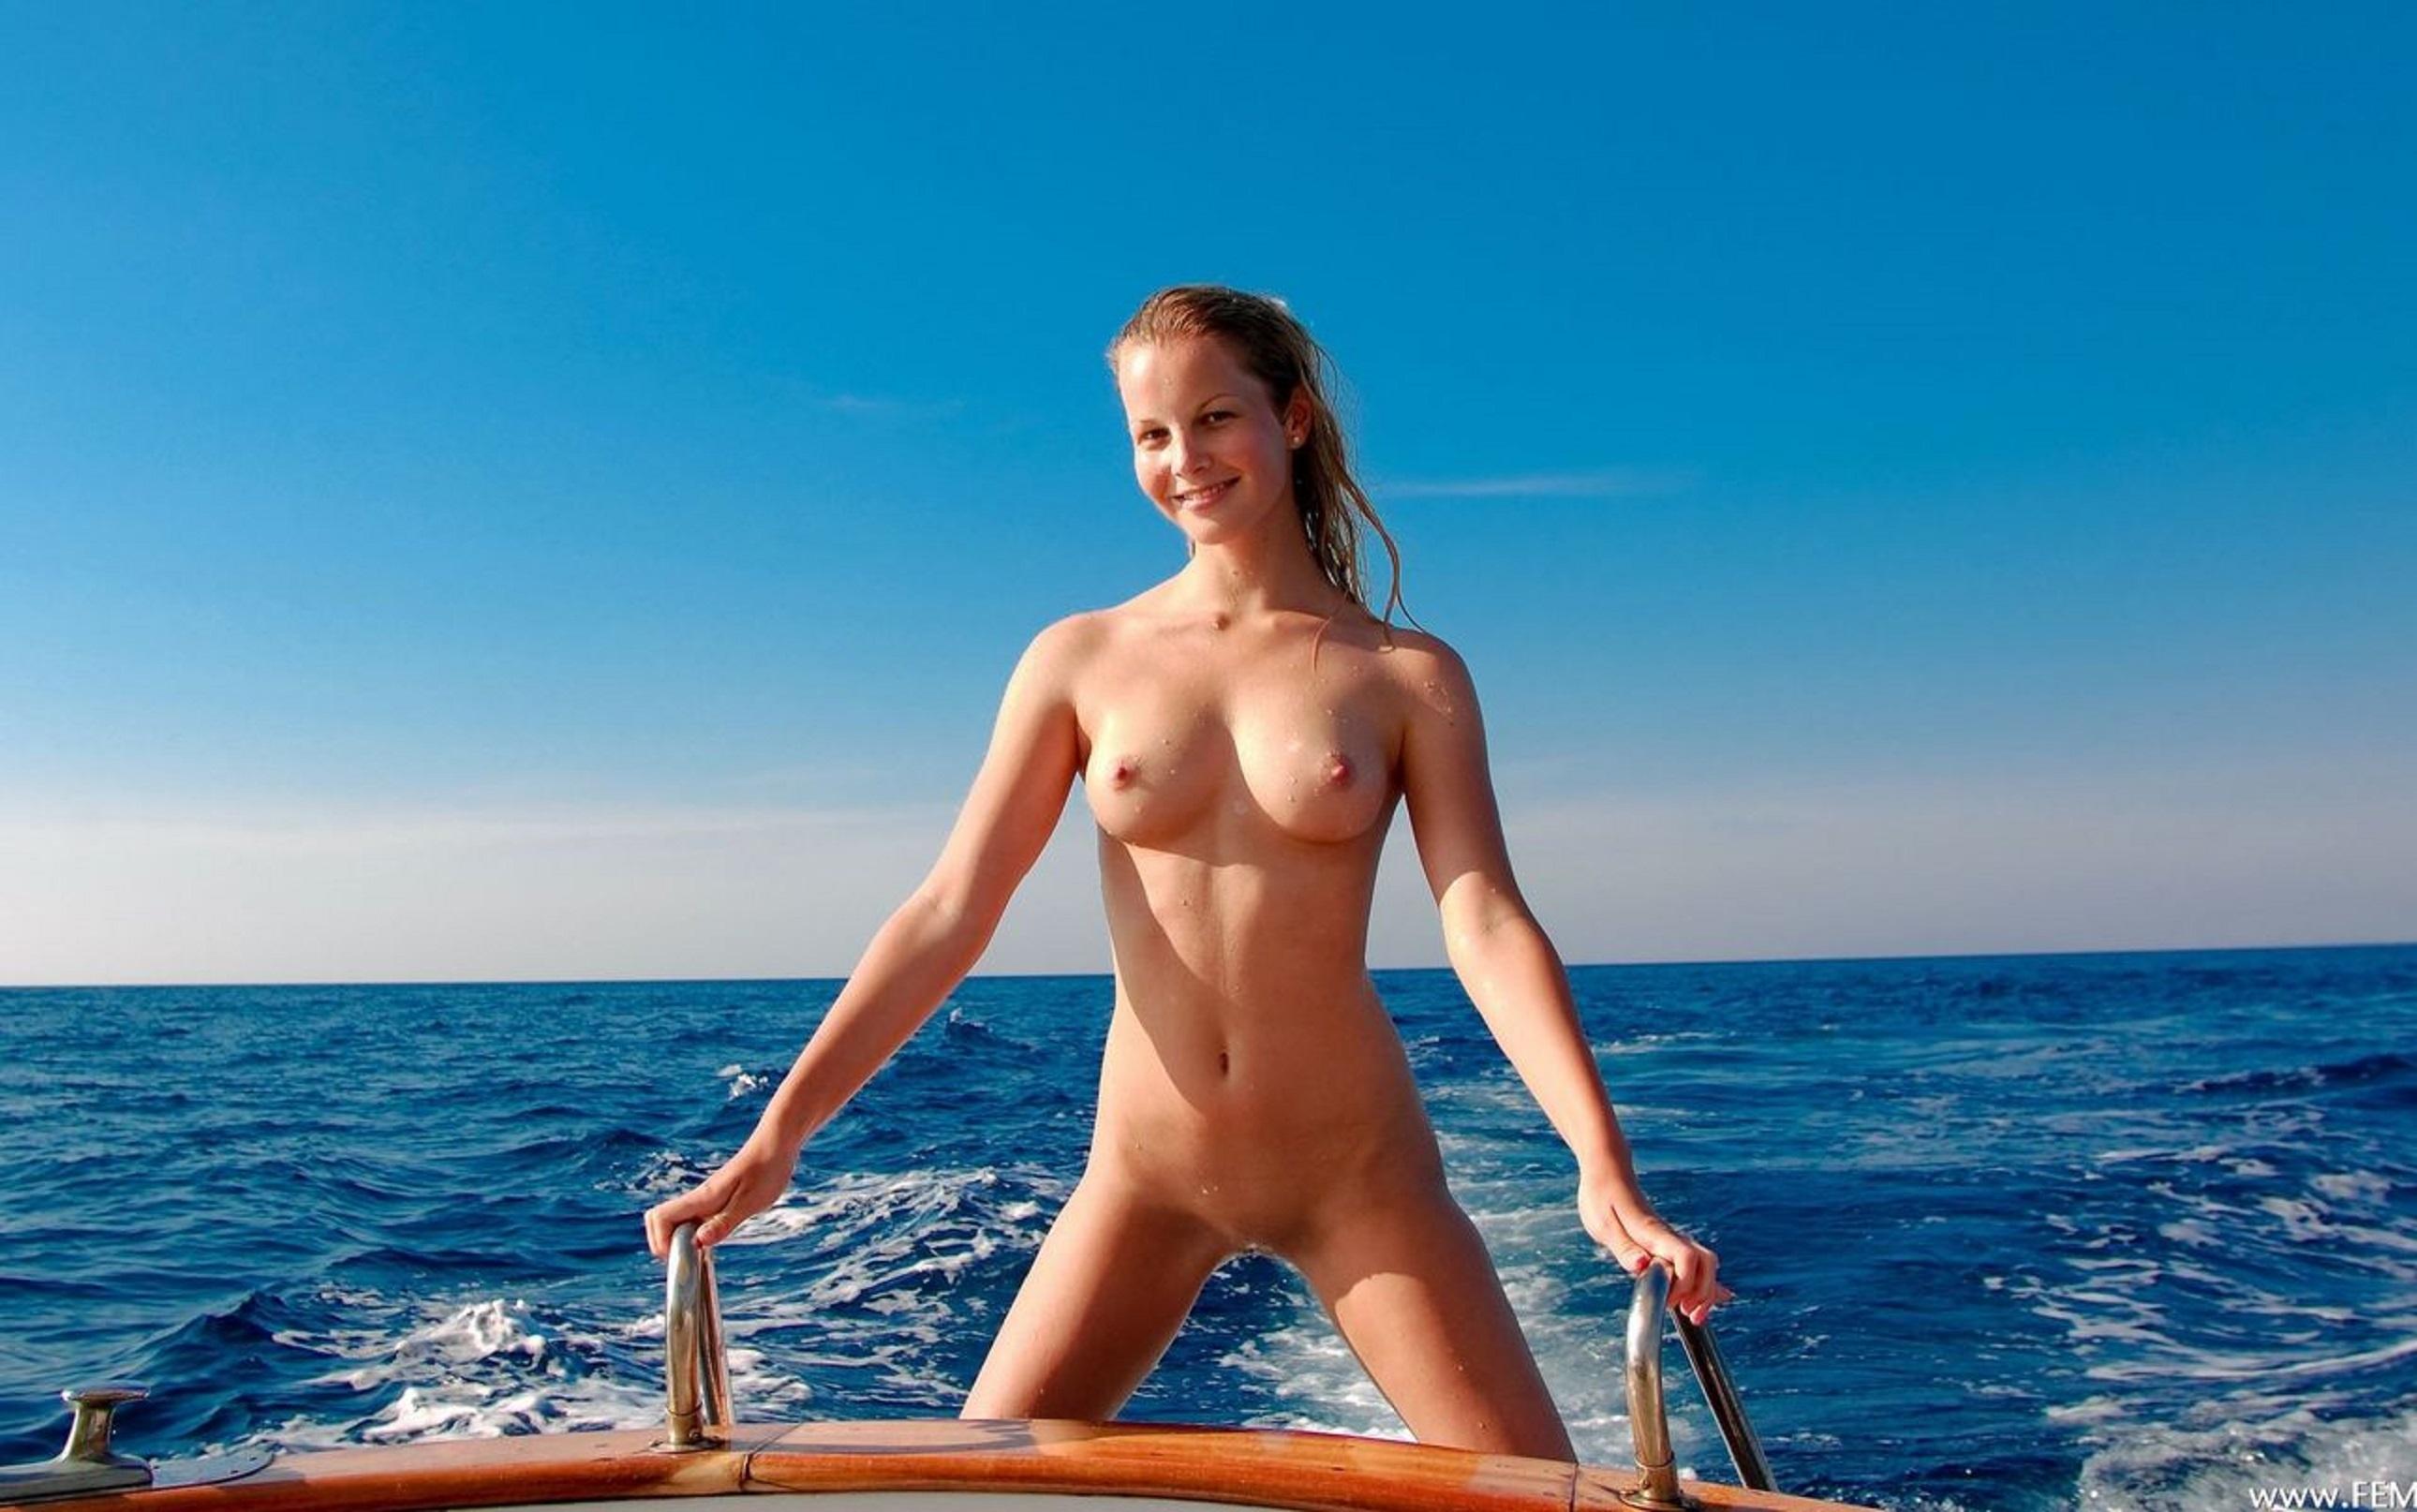 Nude girl straw hat kneeling boat — 6